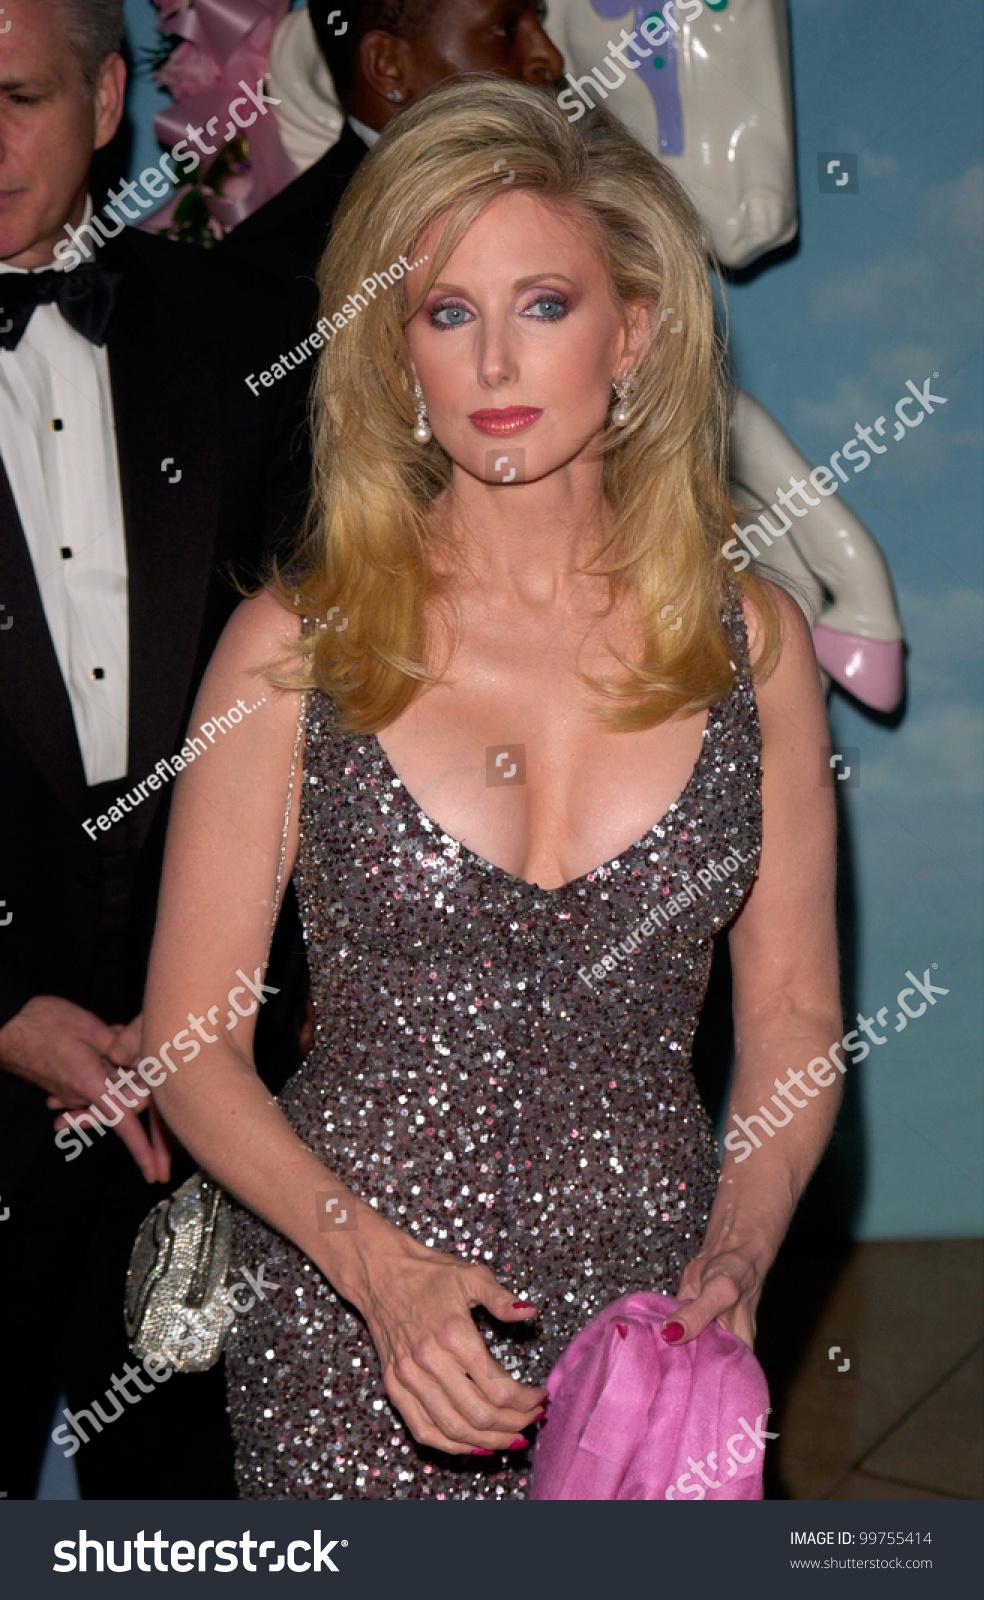 Celebrity Julia Michaels nude photos 2019